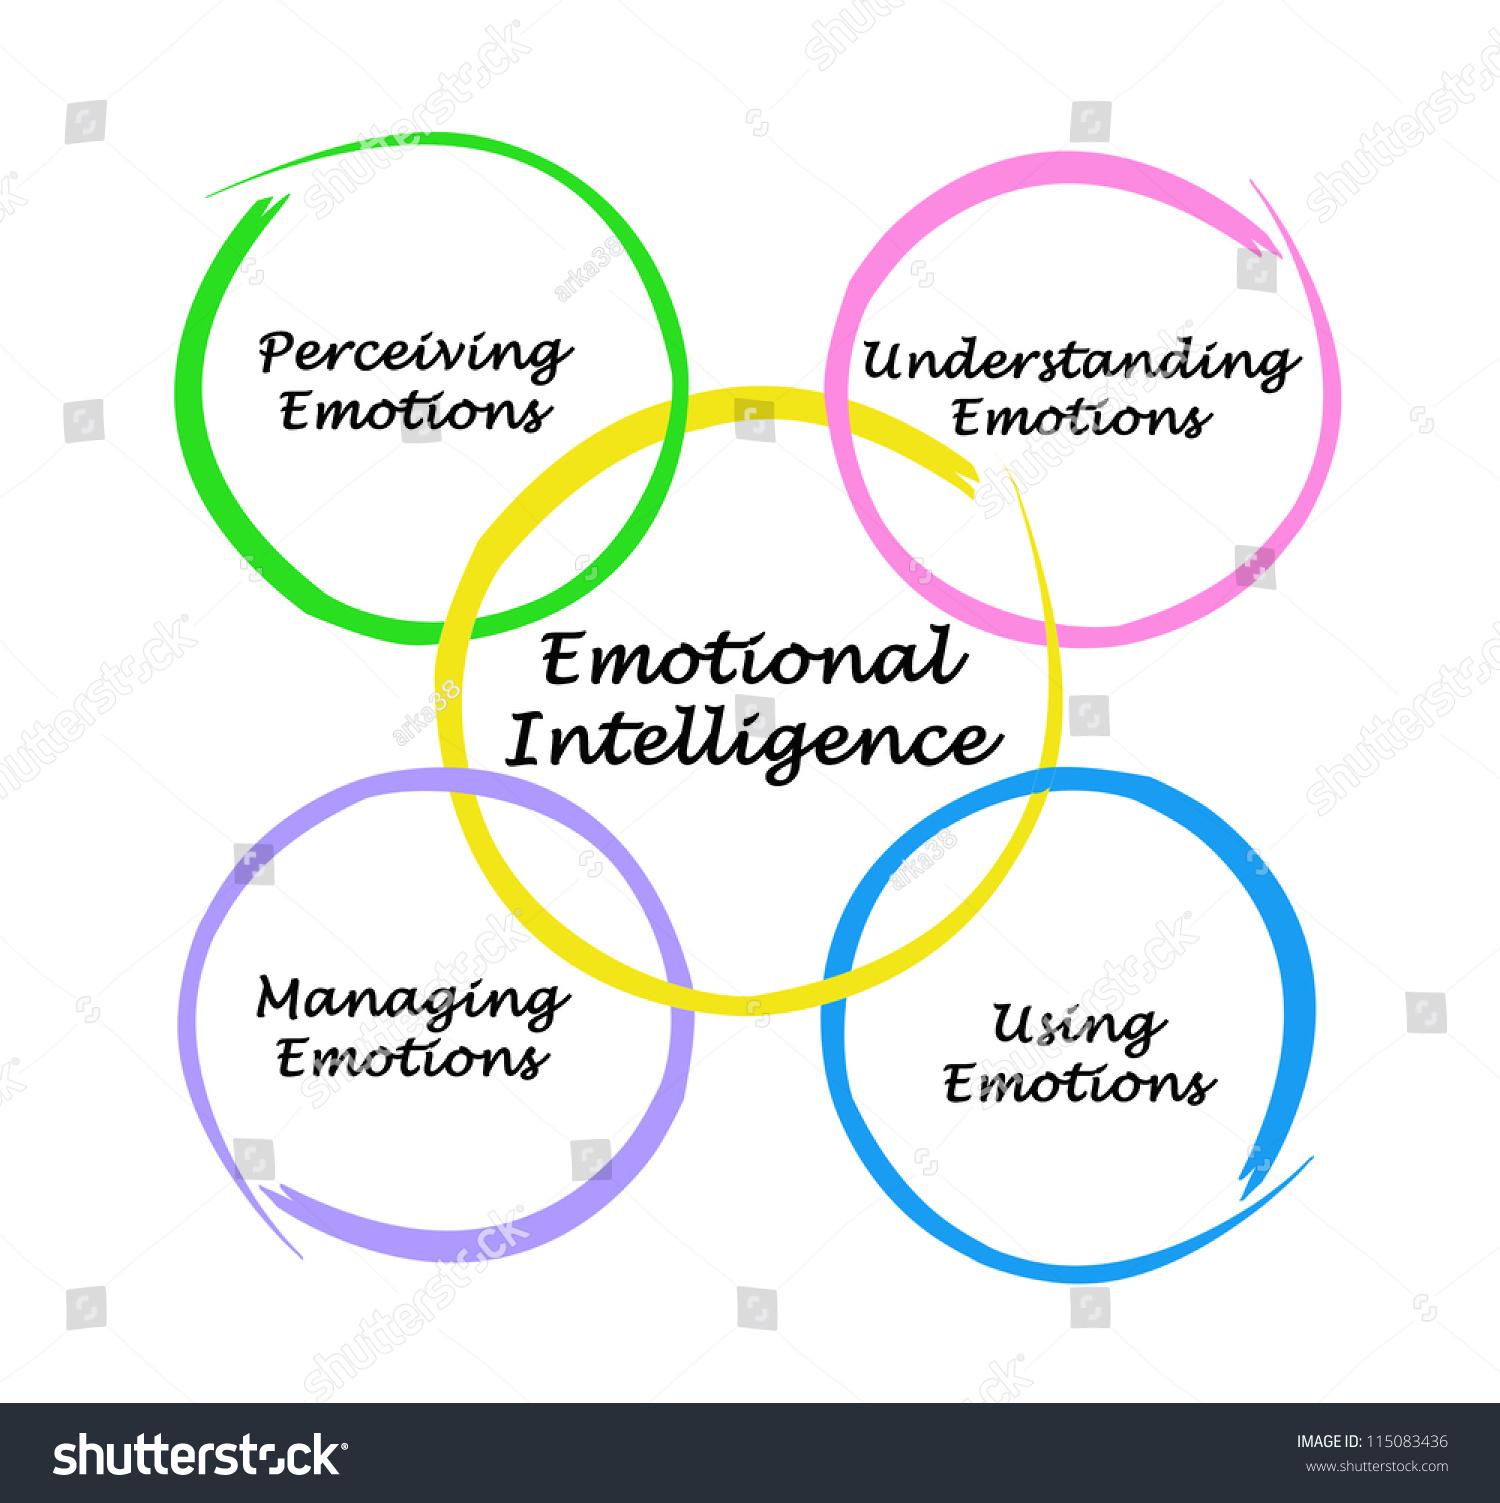 Emotional Intelligence Clip Art  U2013 Cliparts